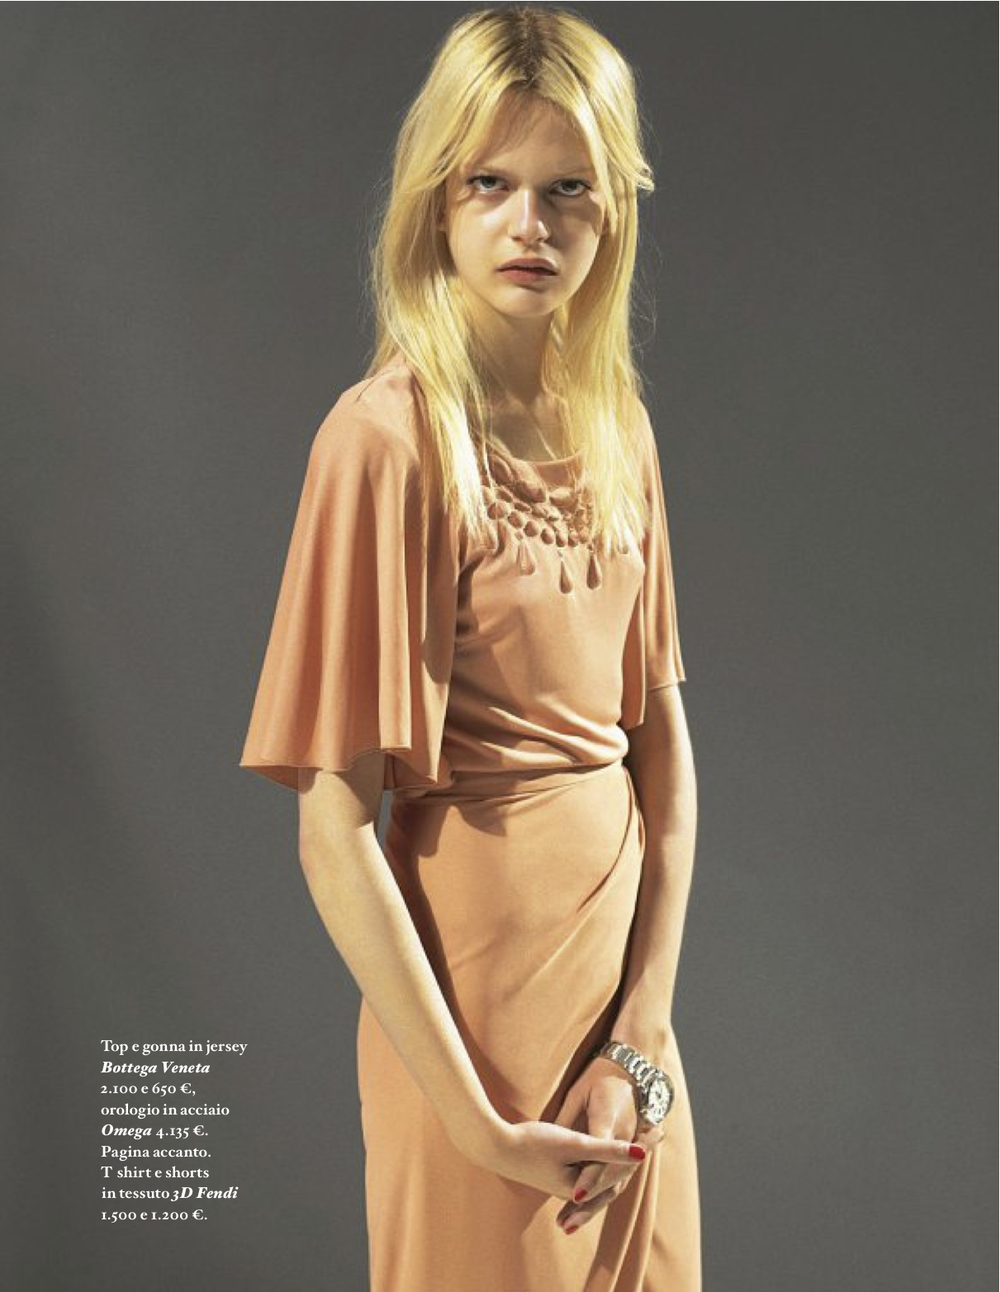 Less is more… A beautiful monochromatic look byBottega Veneta